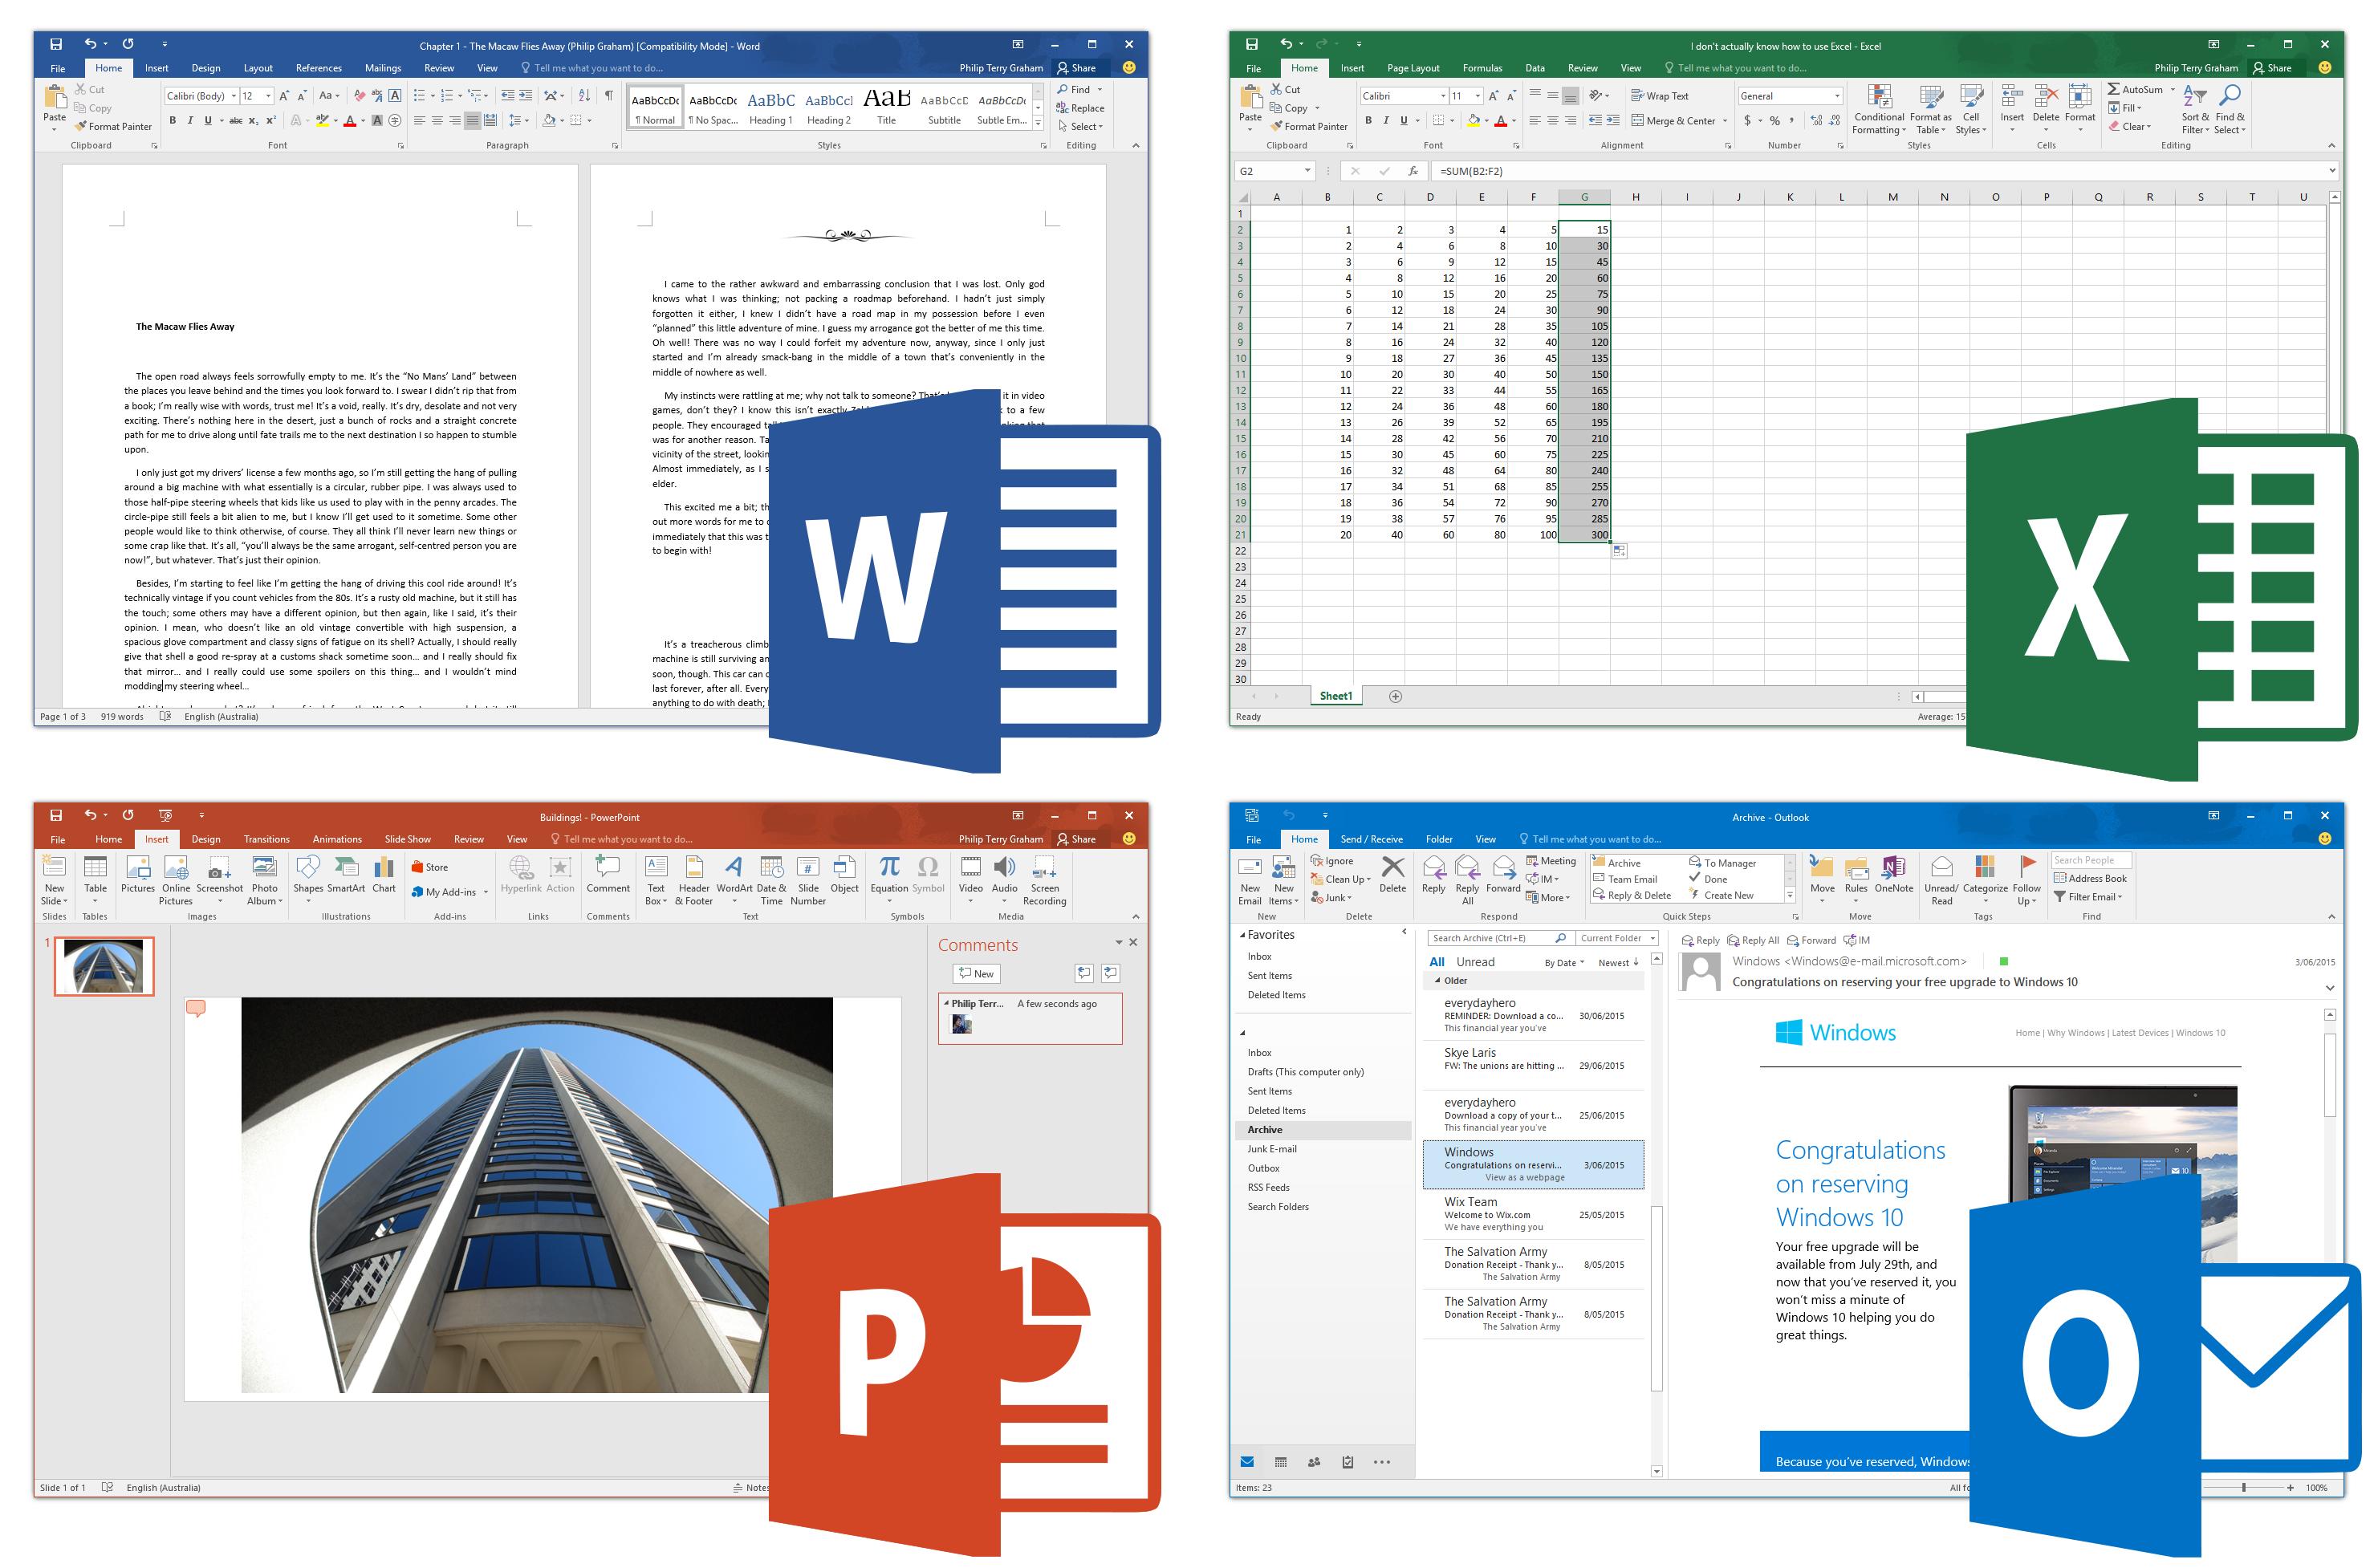 Running windows vista and microsoft office including powerpoint - Running Windows Vista And Microsoft Office Including Powerpoint 4